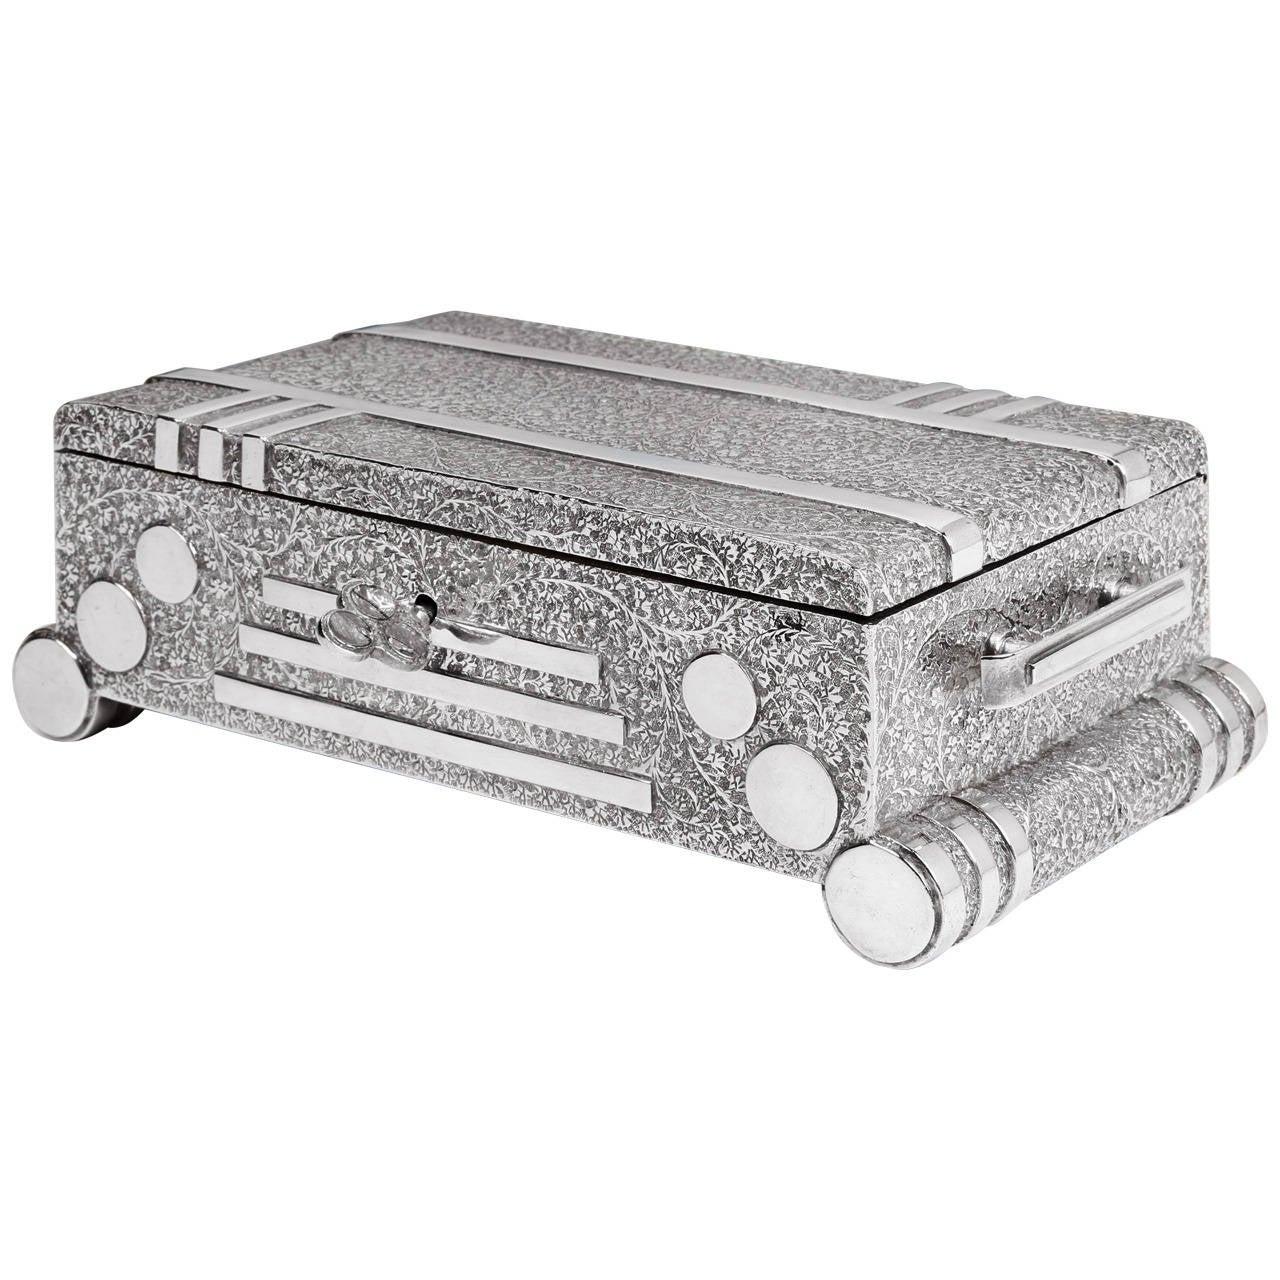 Art Deco 'Radio' Trinket Box